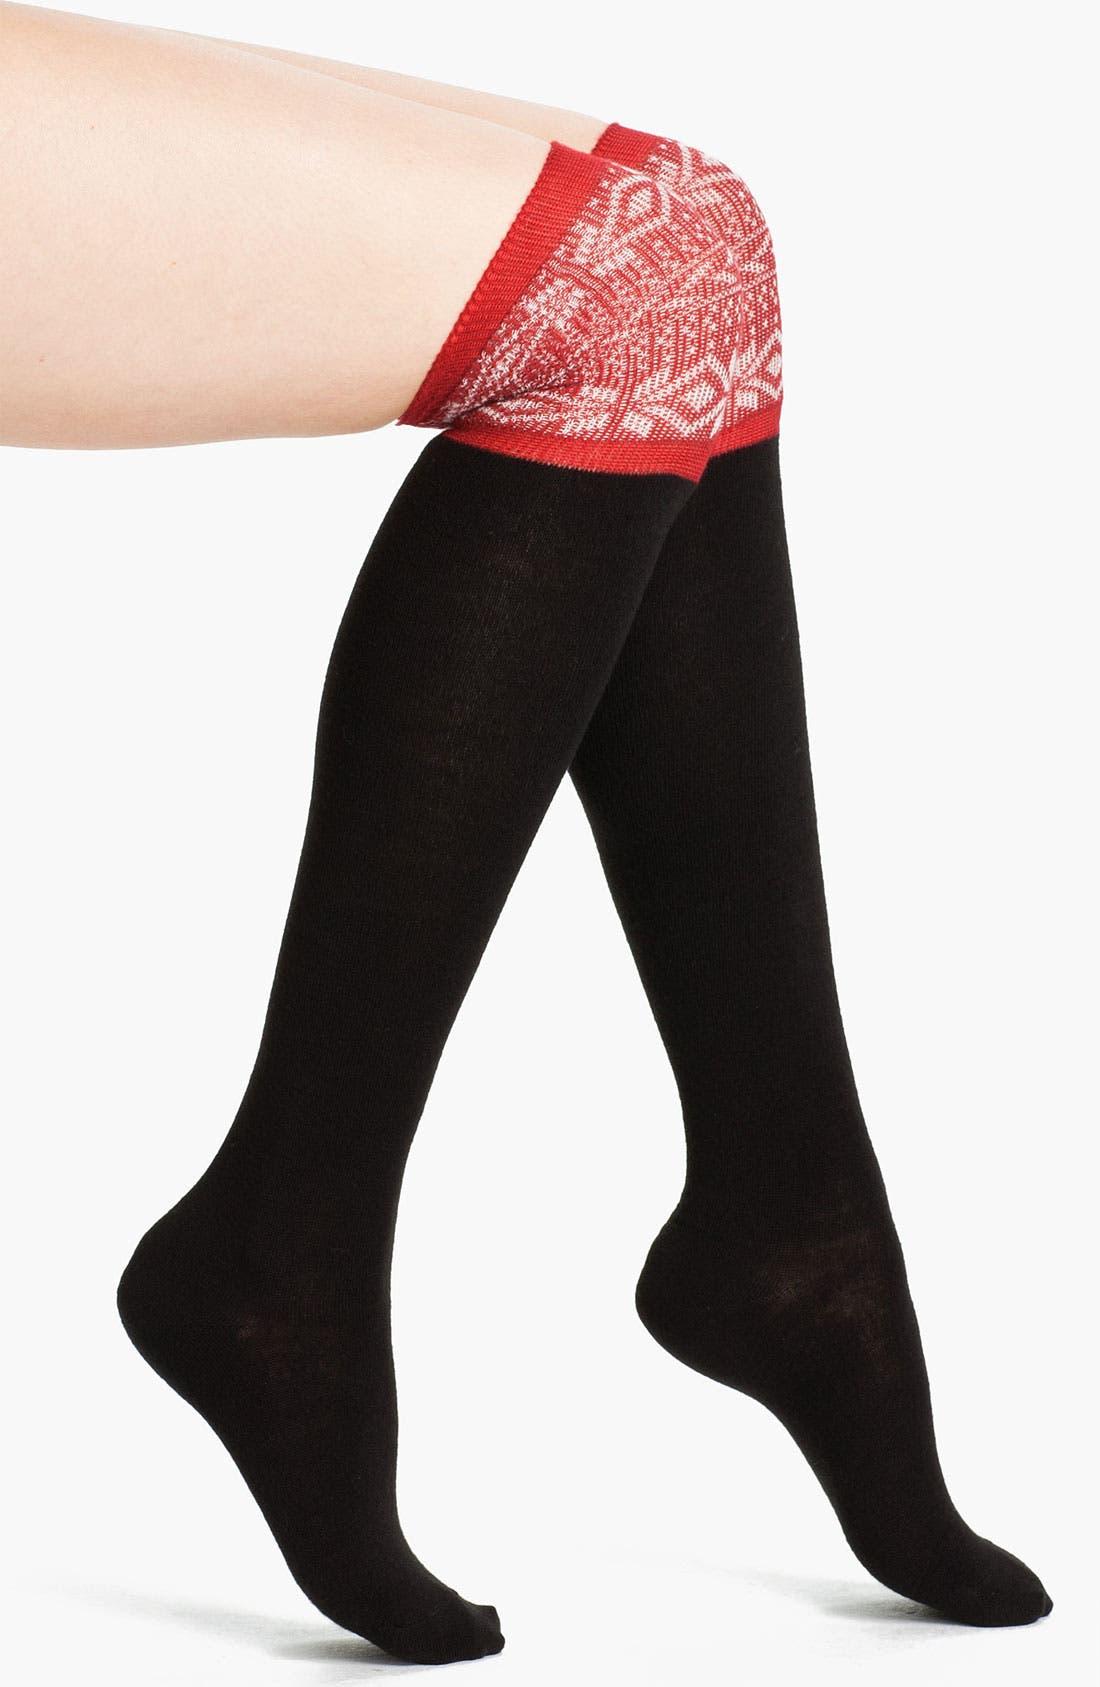 Main Image - Hue 'Nordic' Over the Knee Socks